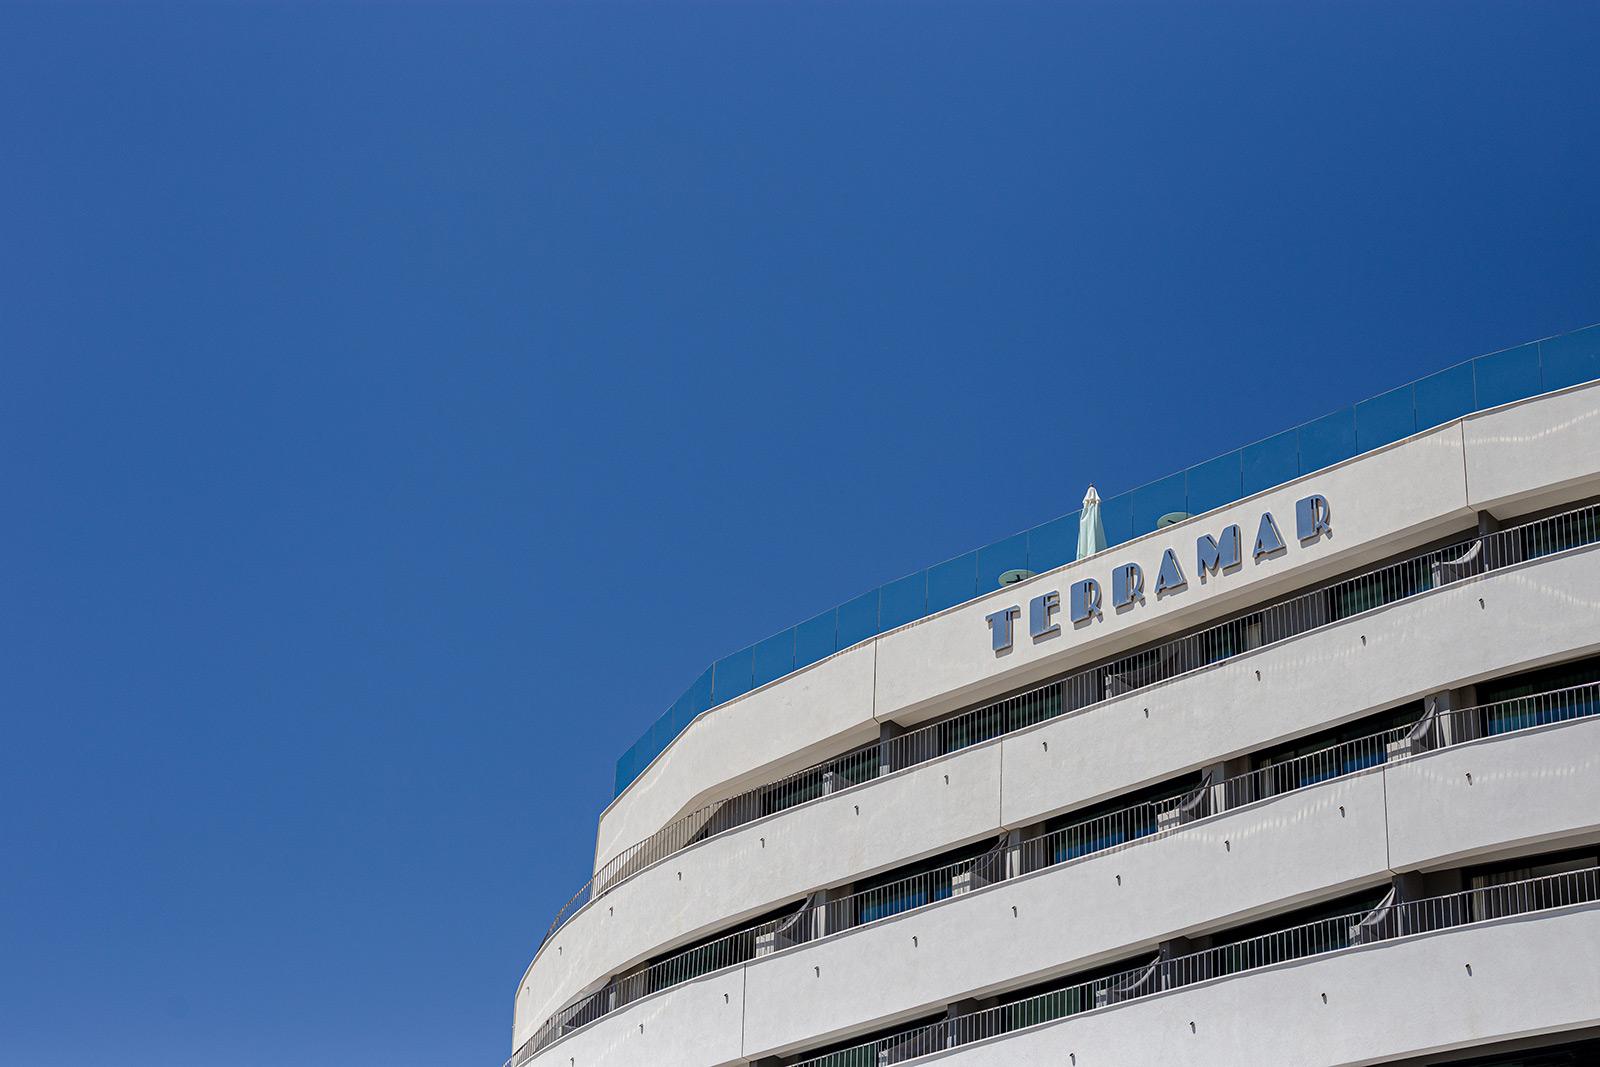 Terramar Hotel in Sitges